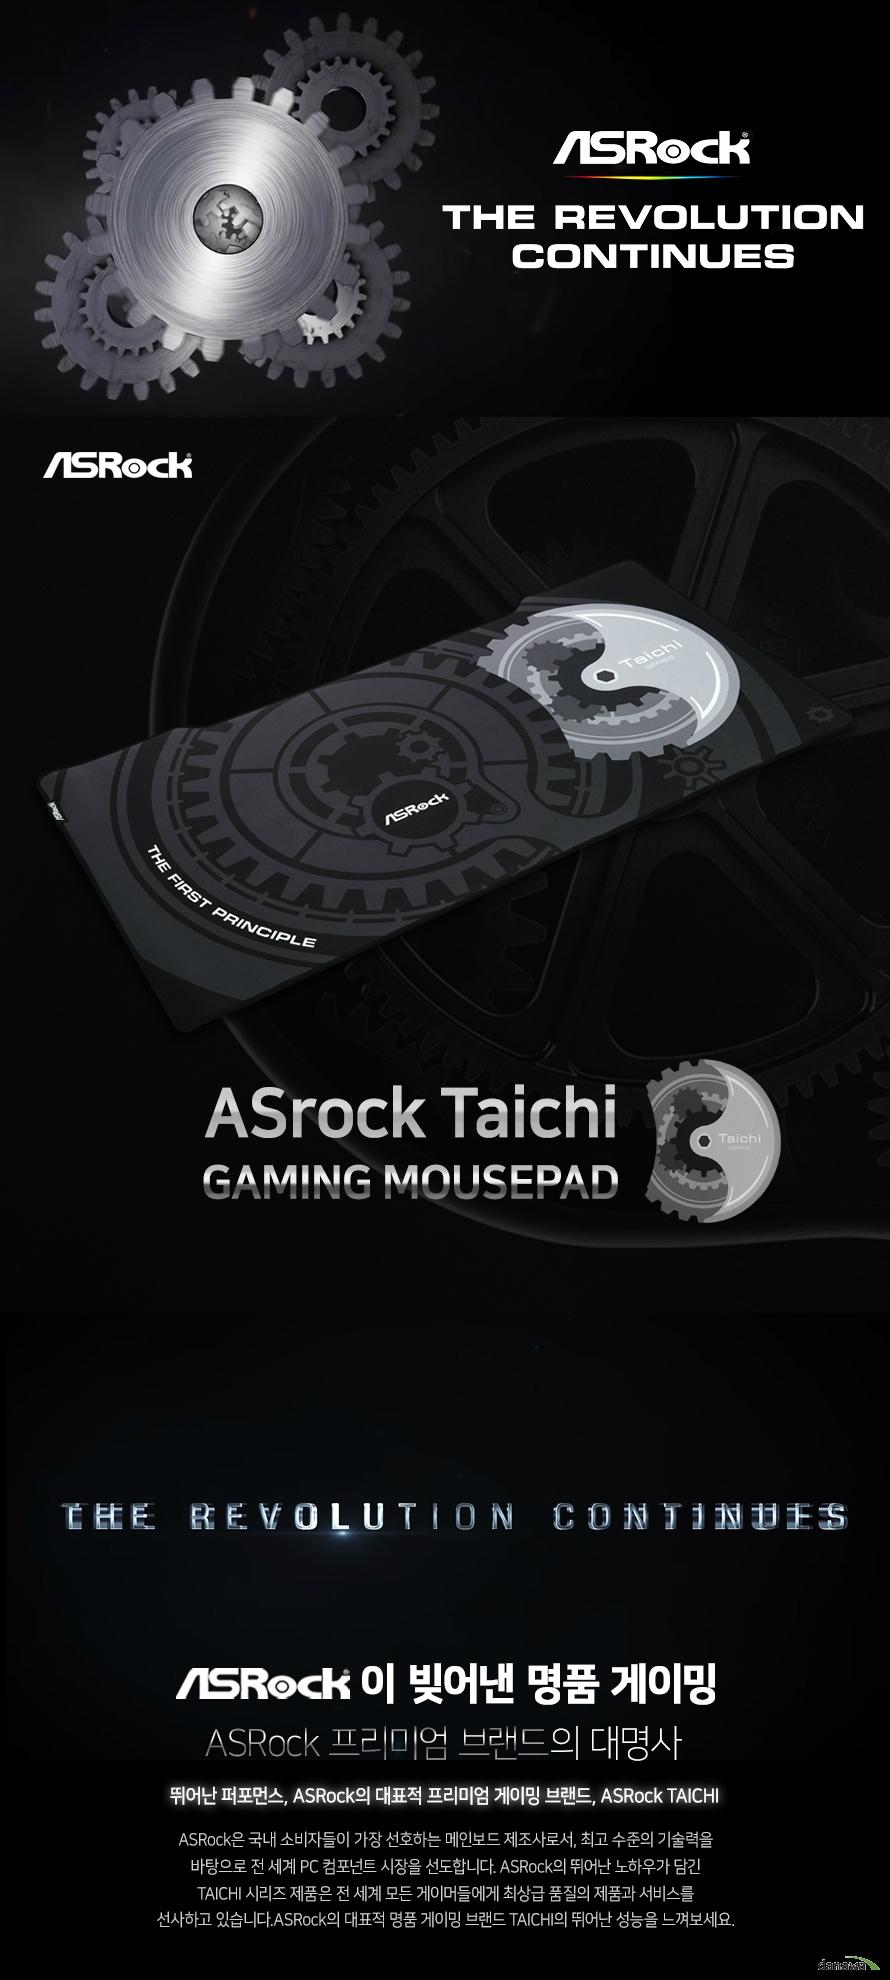 ASRock Taichi 게이밍 마우스패드  제품 크기  길이 805 밀리미터 넓이 405 밀리미터 두께 3 밀리미터